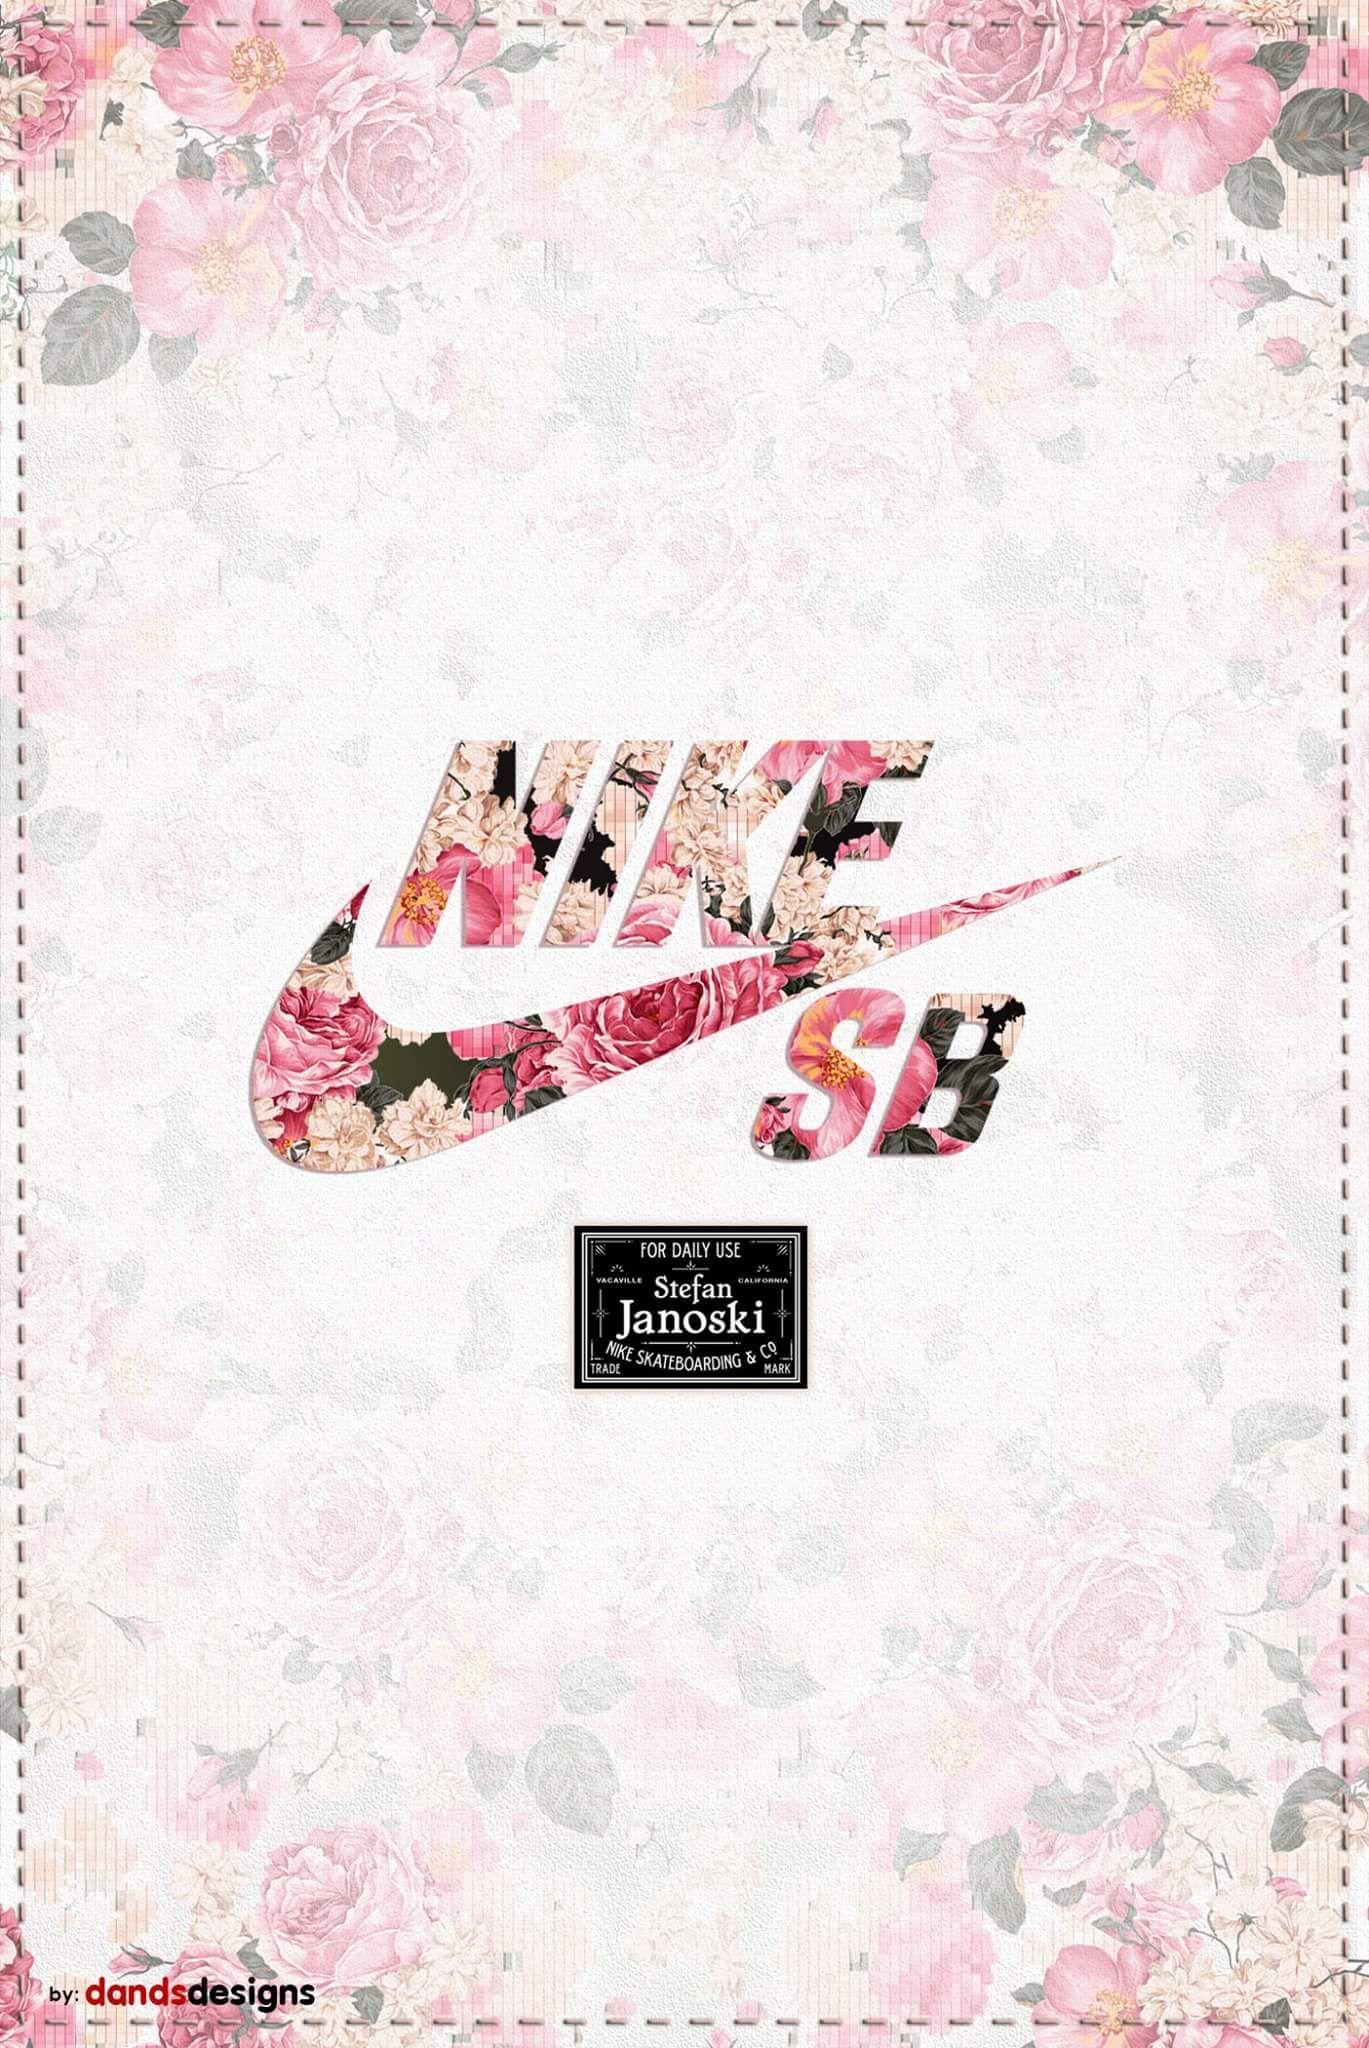 Nike Sb Wallpaper Bape Wallpaper Iphone Nike Wallpaper